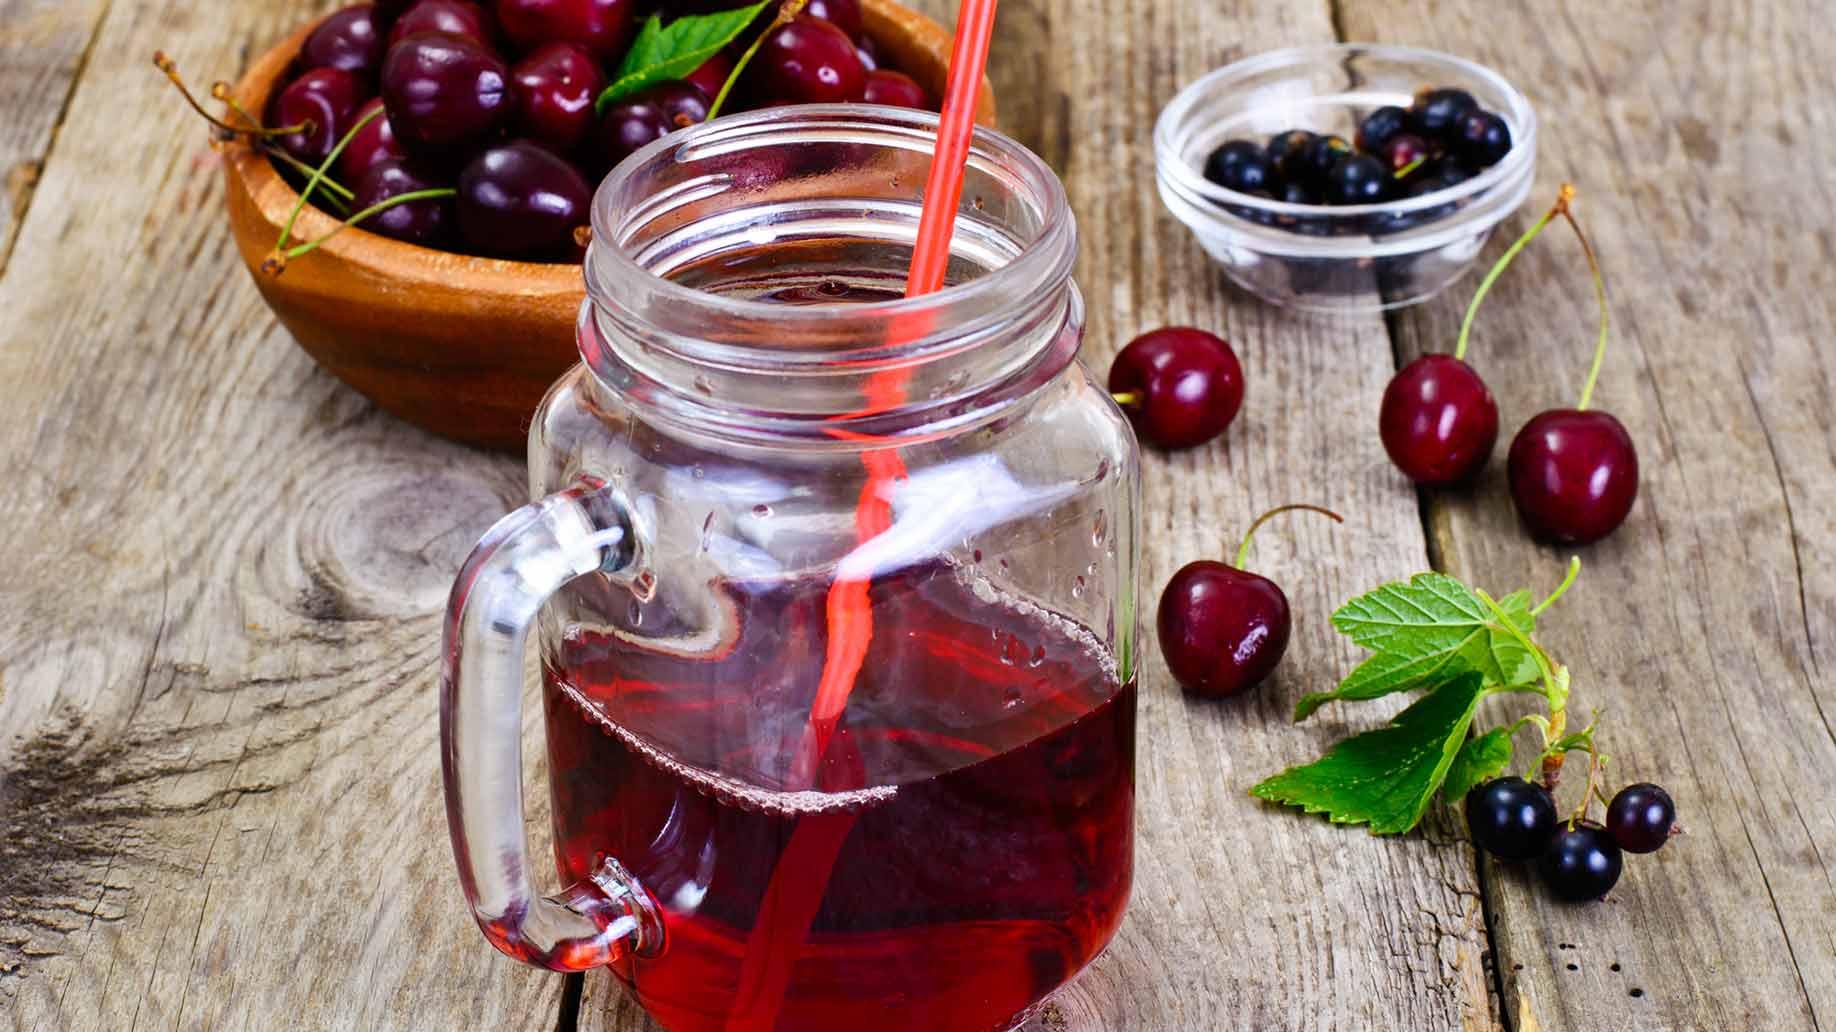 tart cherries juice gout flair up inflammation natural remedies